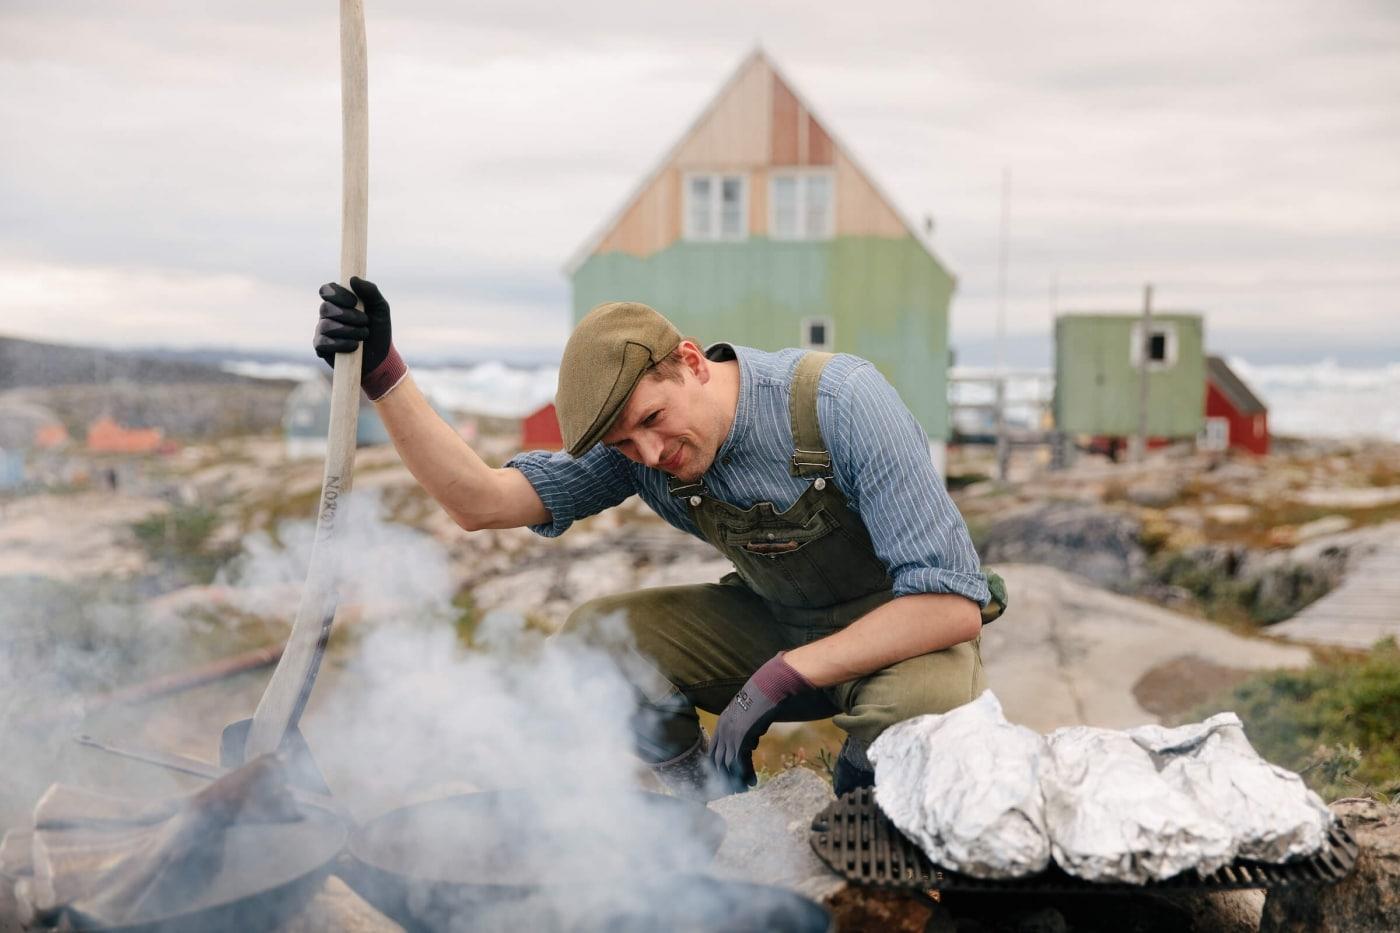 Chef Árni Ólafur Jónsson waits for fish to cook_ii. Photo by Jessie Brinkman Evans - Visit Greenland